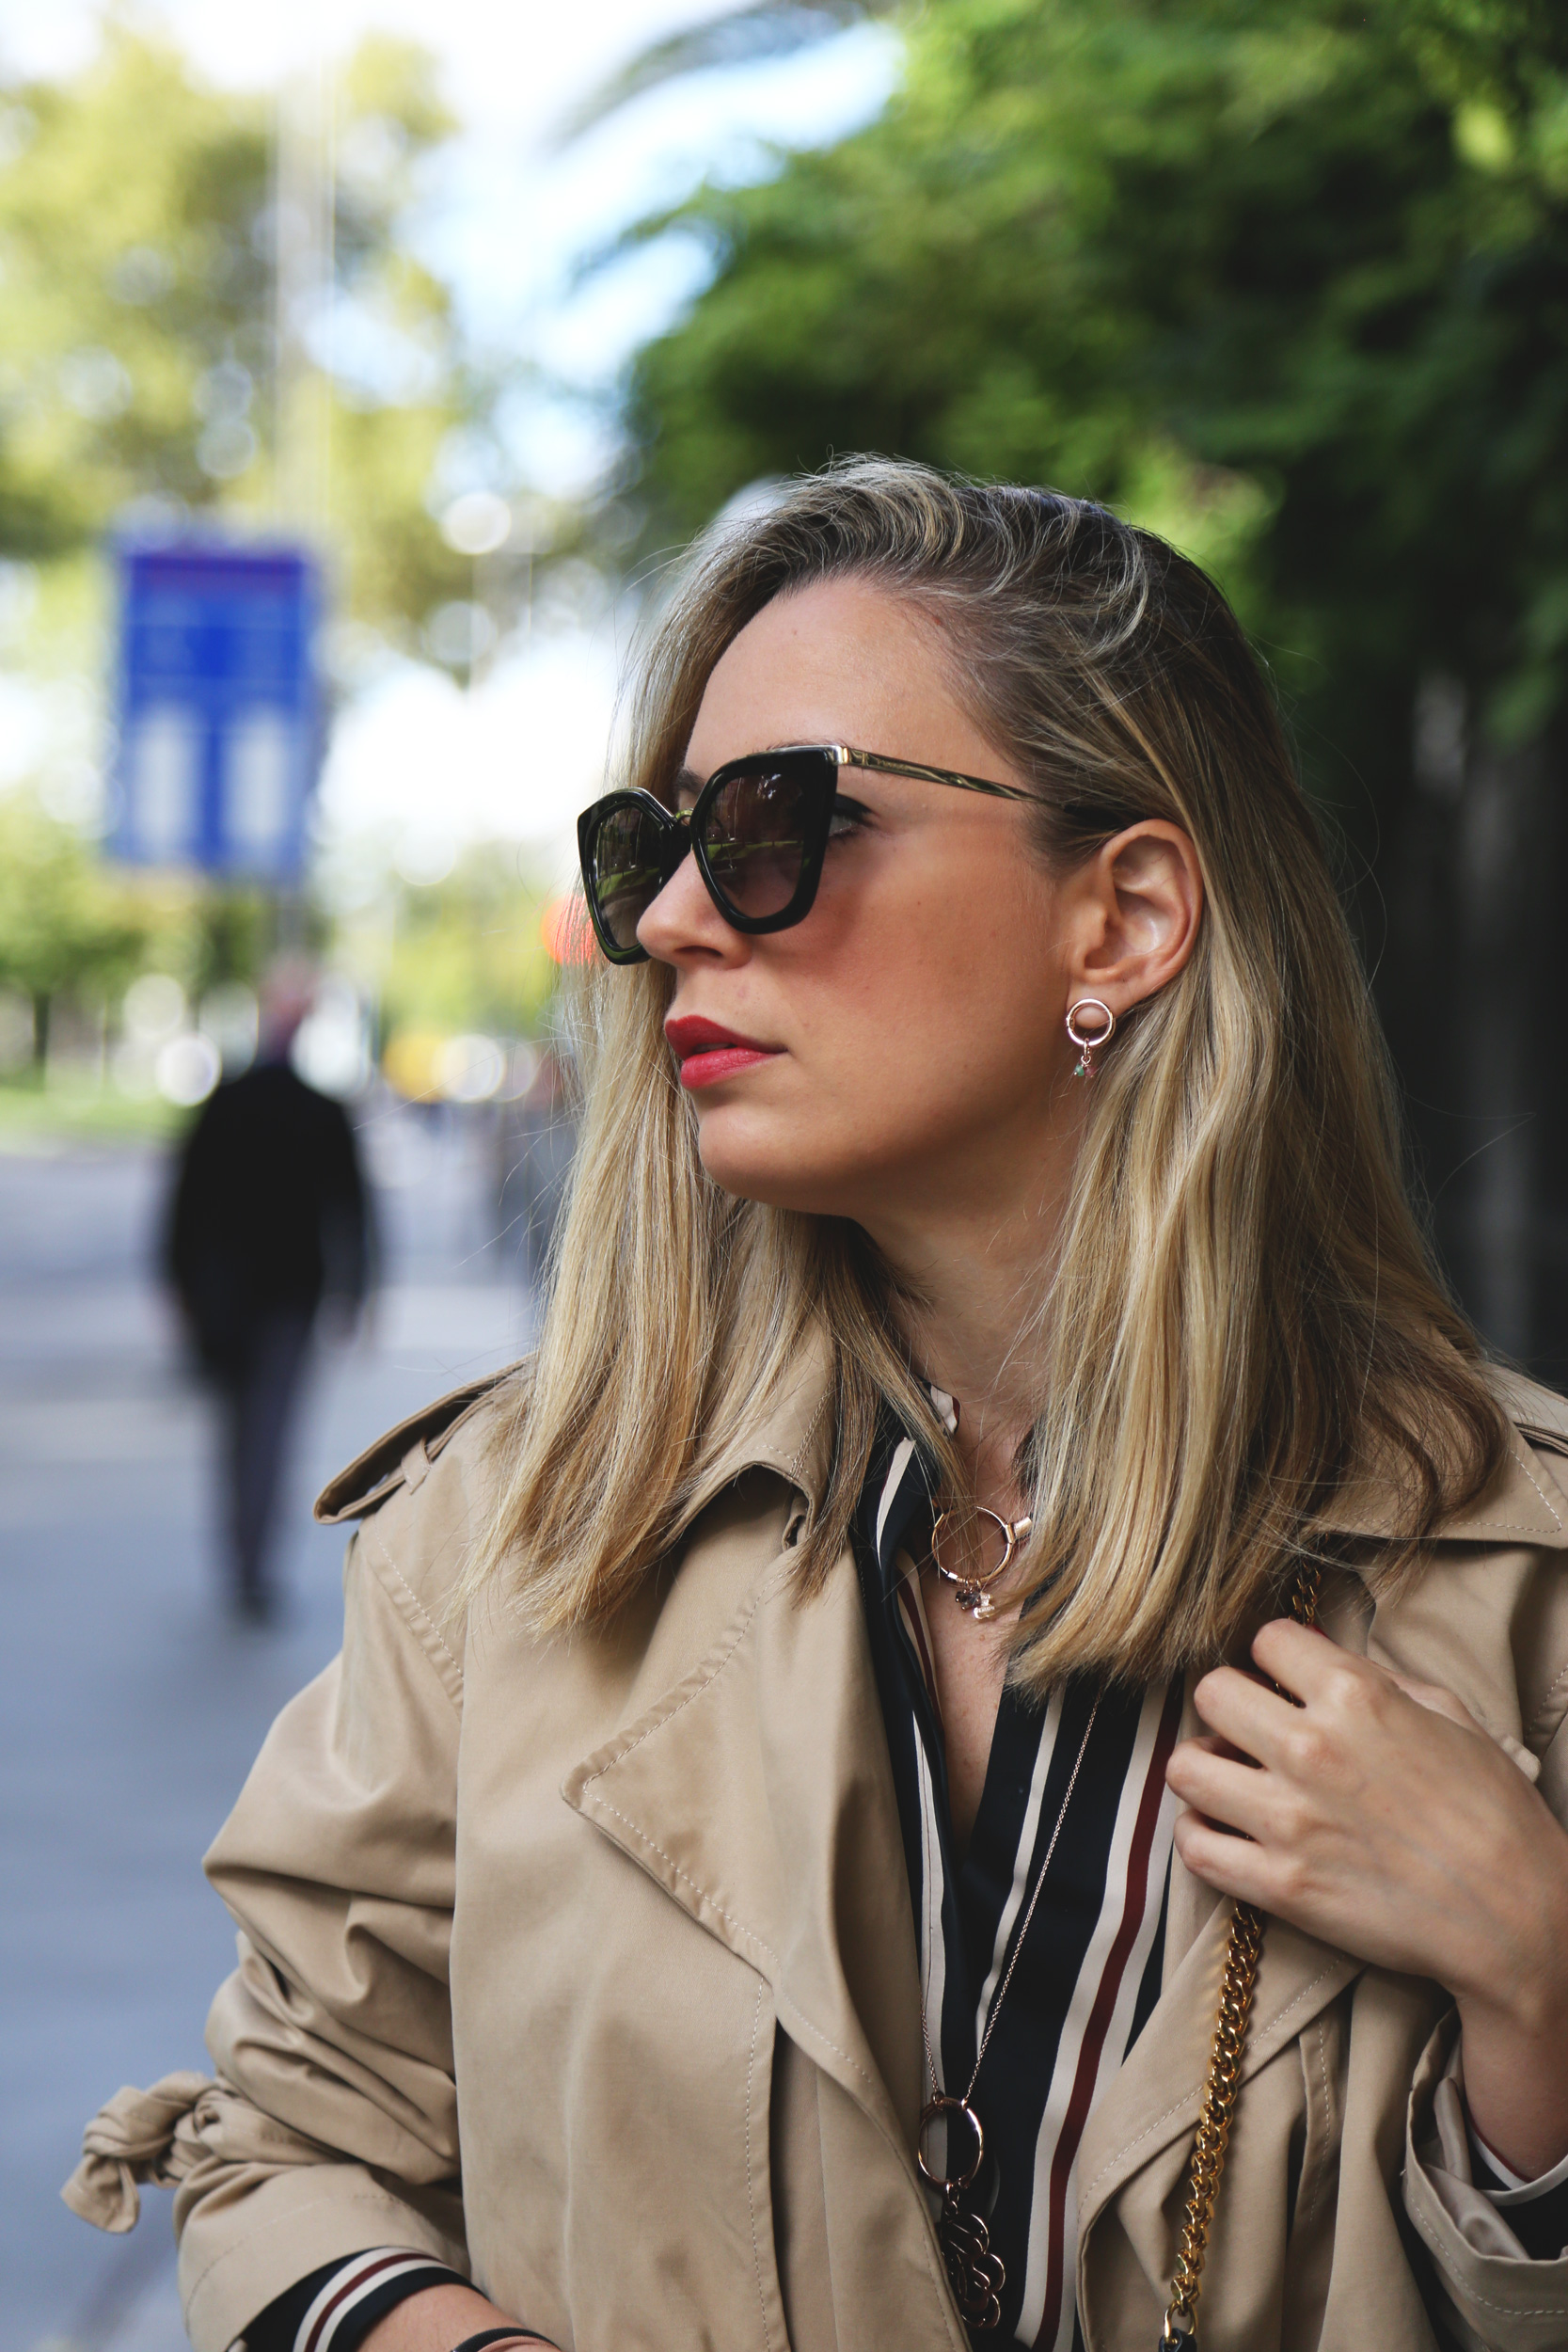 Priscila blogger instagram